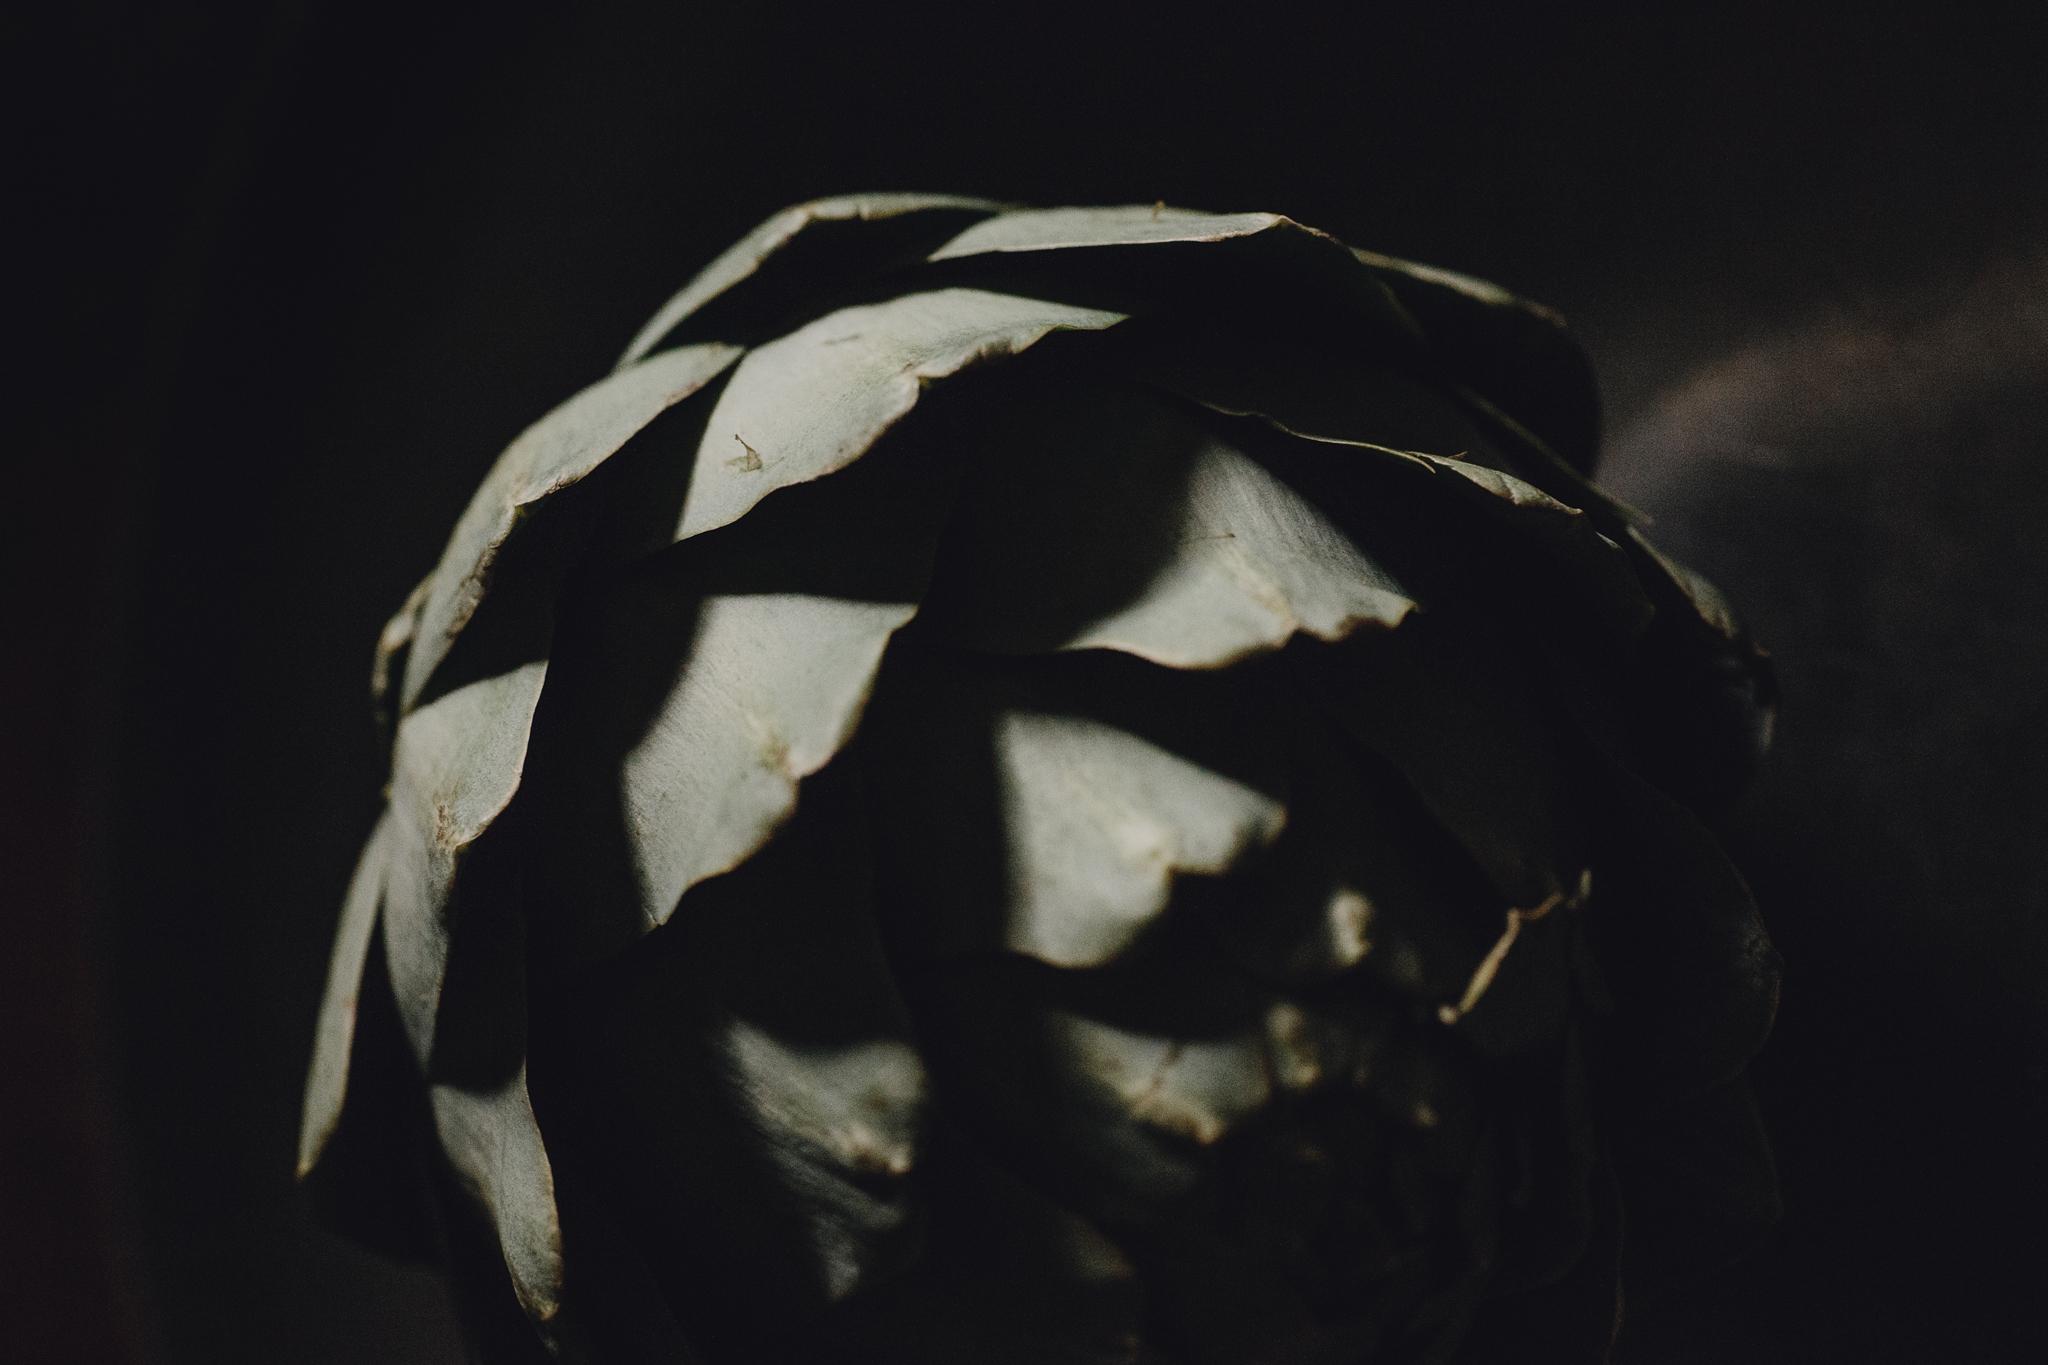 alabaster_abstract_ig_0158.jpg